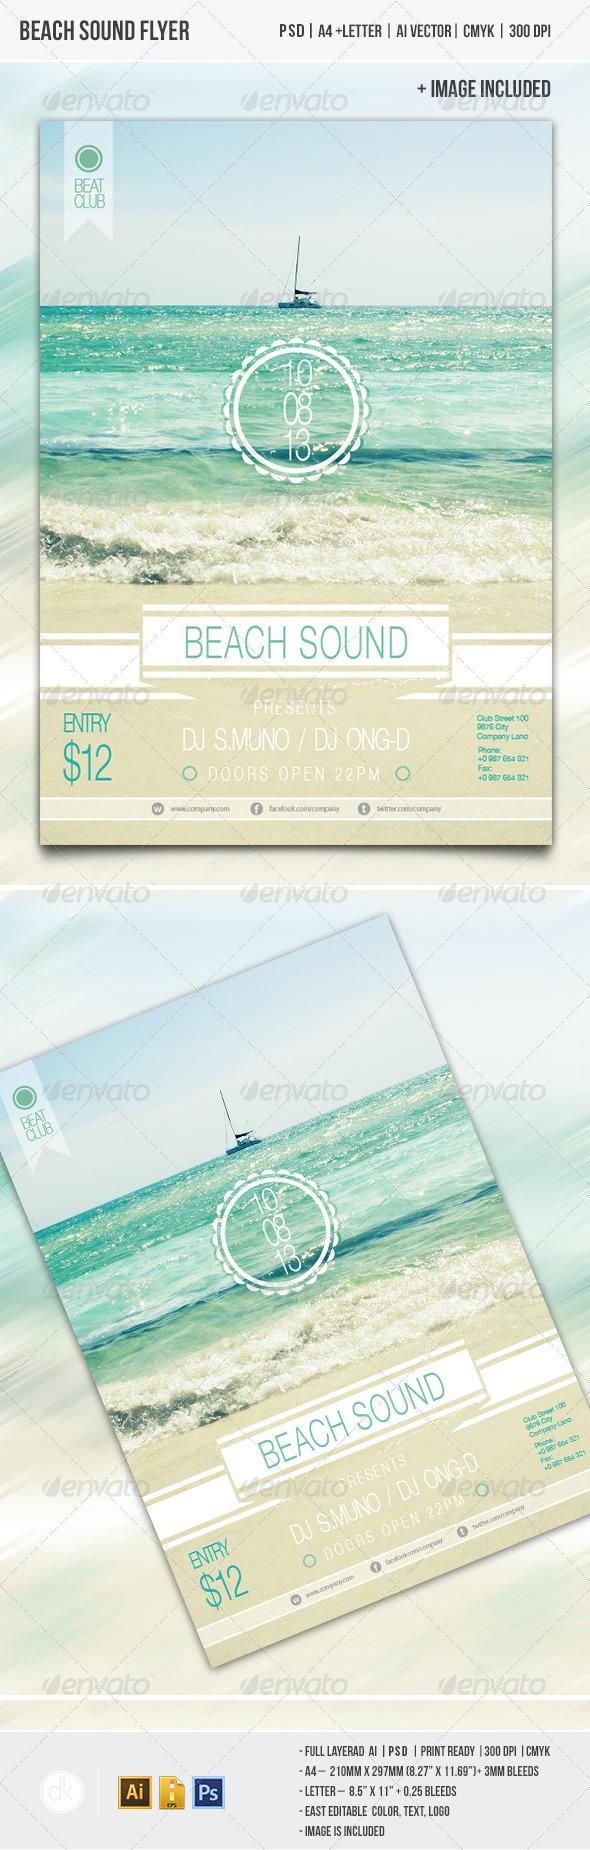 GraphicRiver Beach Sound Flyer 4360264